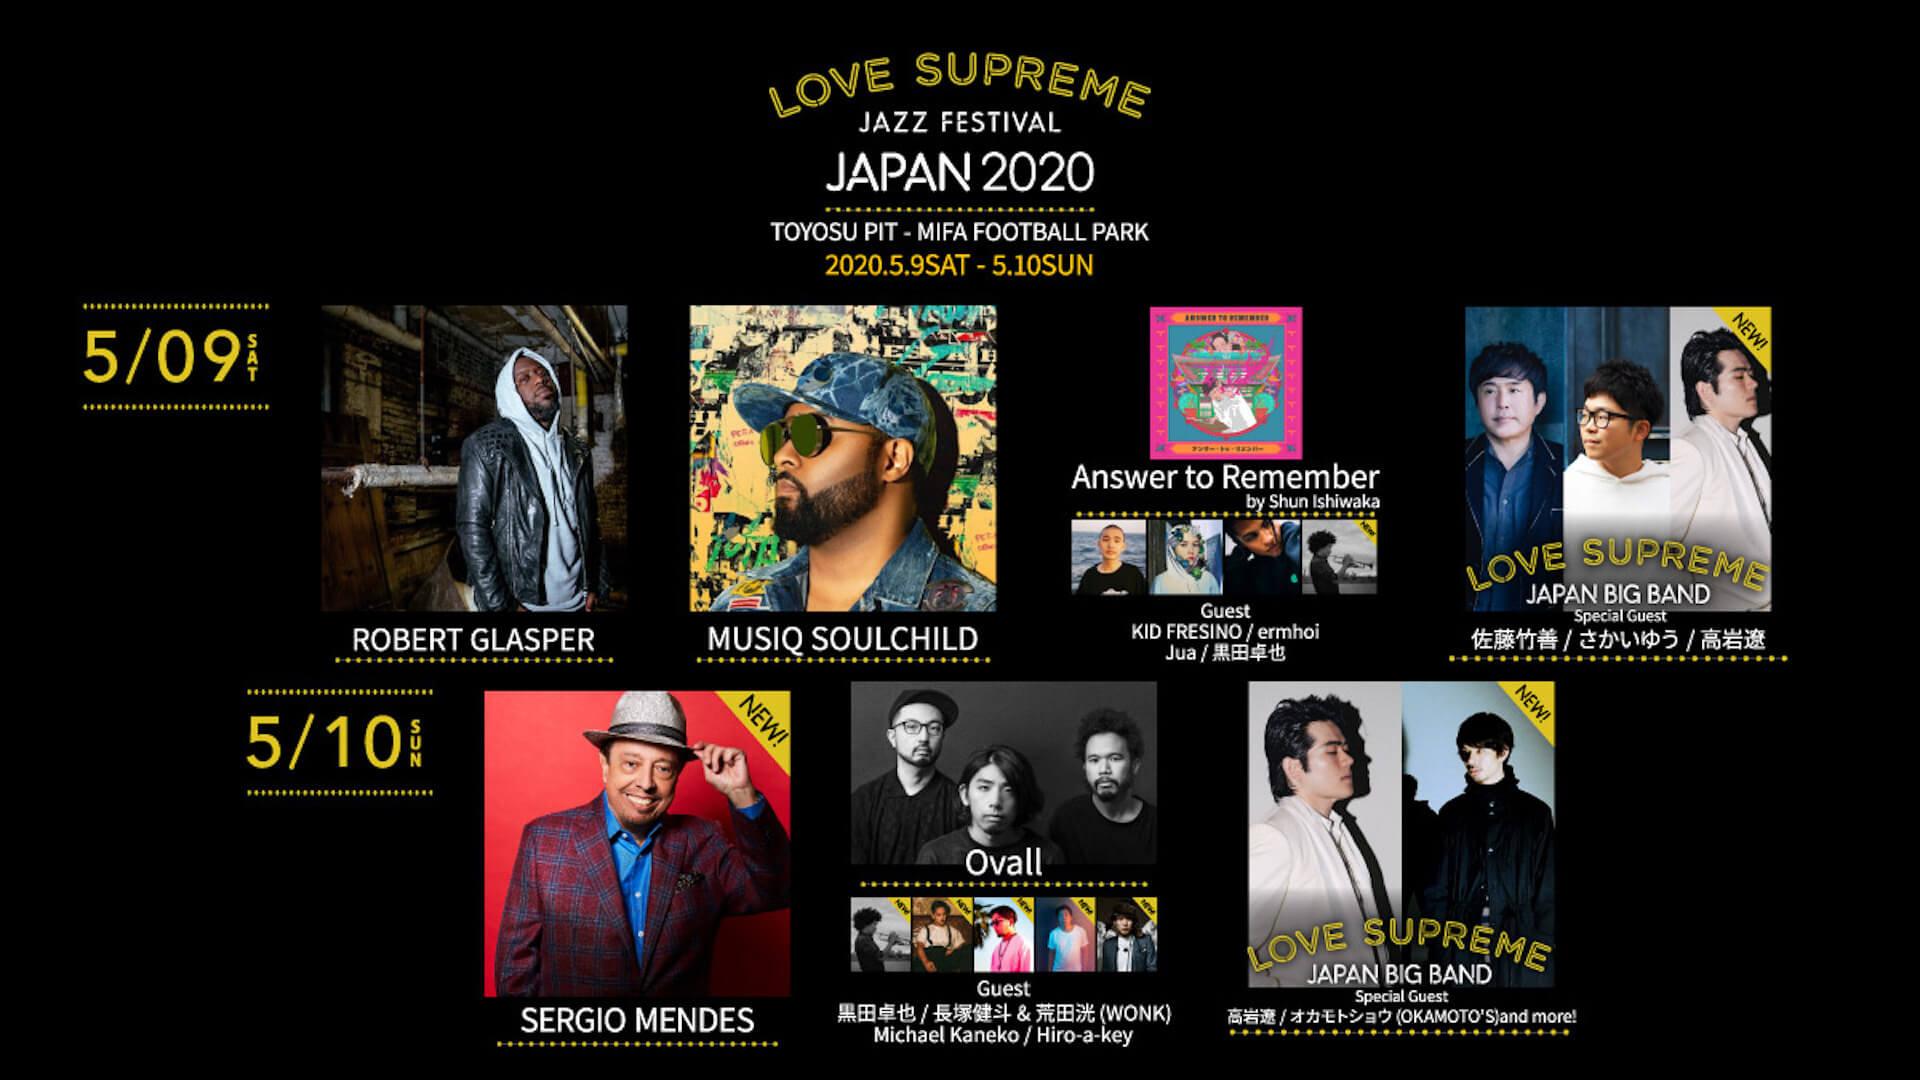 <LOVE SUPREME JAZZ FESTIVAL JAPAN 2020>第3弾アーティストでセルジオ・メンデス、LOVE SUPREME JAPAN BIG BANDの出演が発表!黒田卓也、高岩遼、さかいゆうらもゲスト出演 music200316_lovesupremejazzfes_1